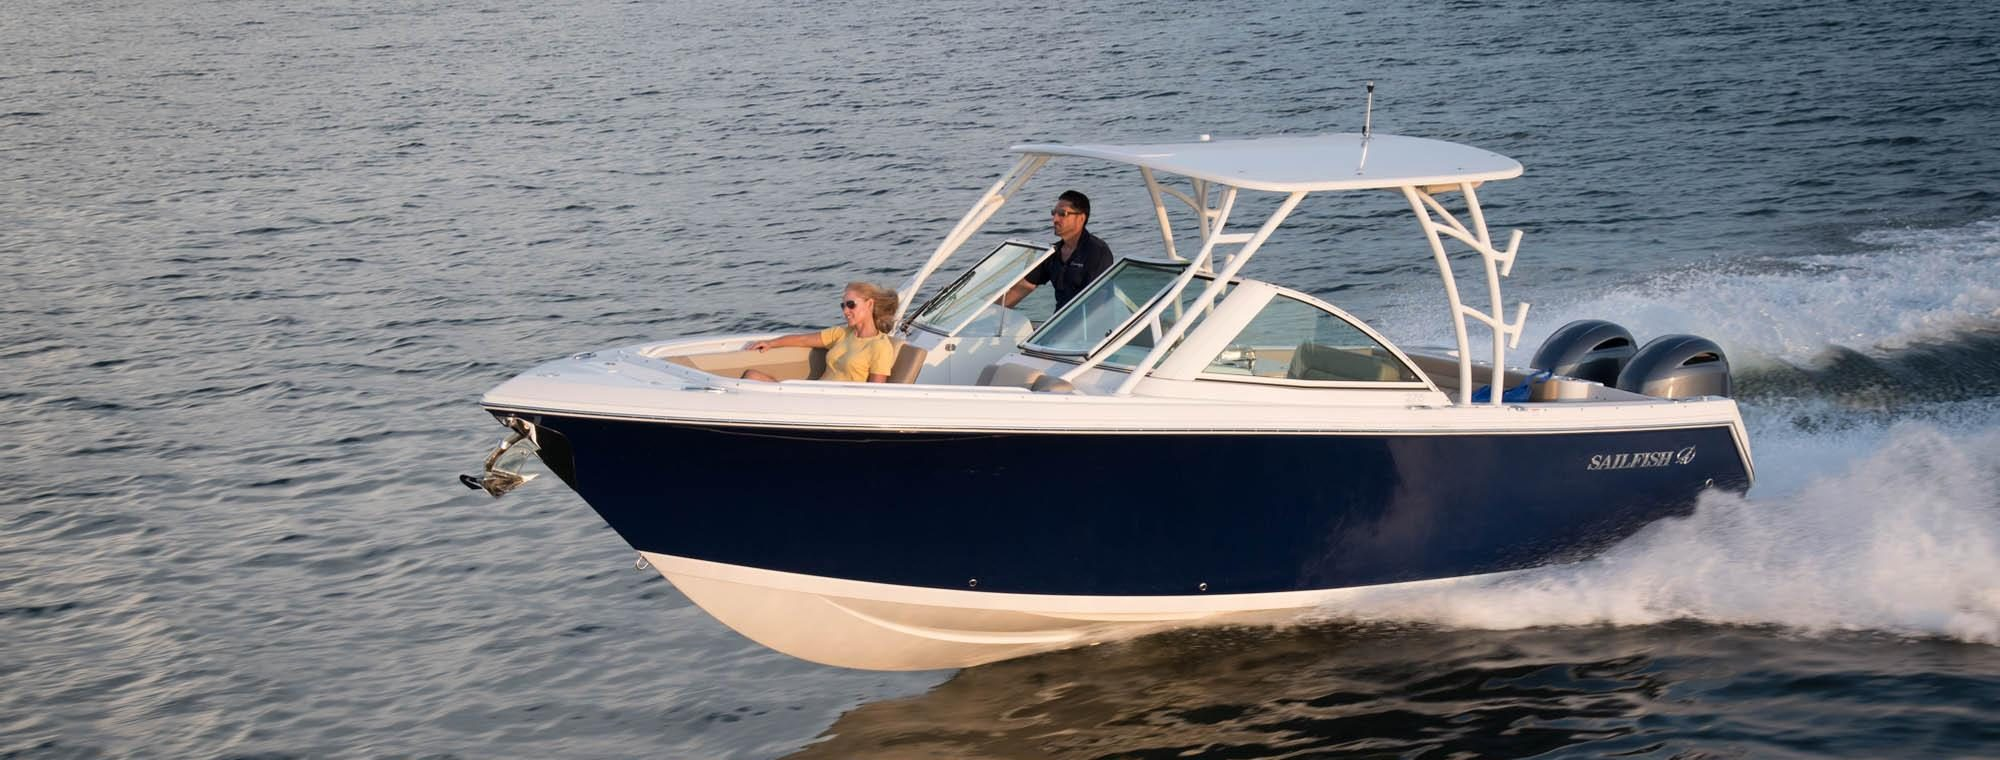 Sailfish Boats 275